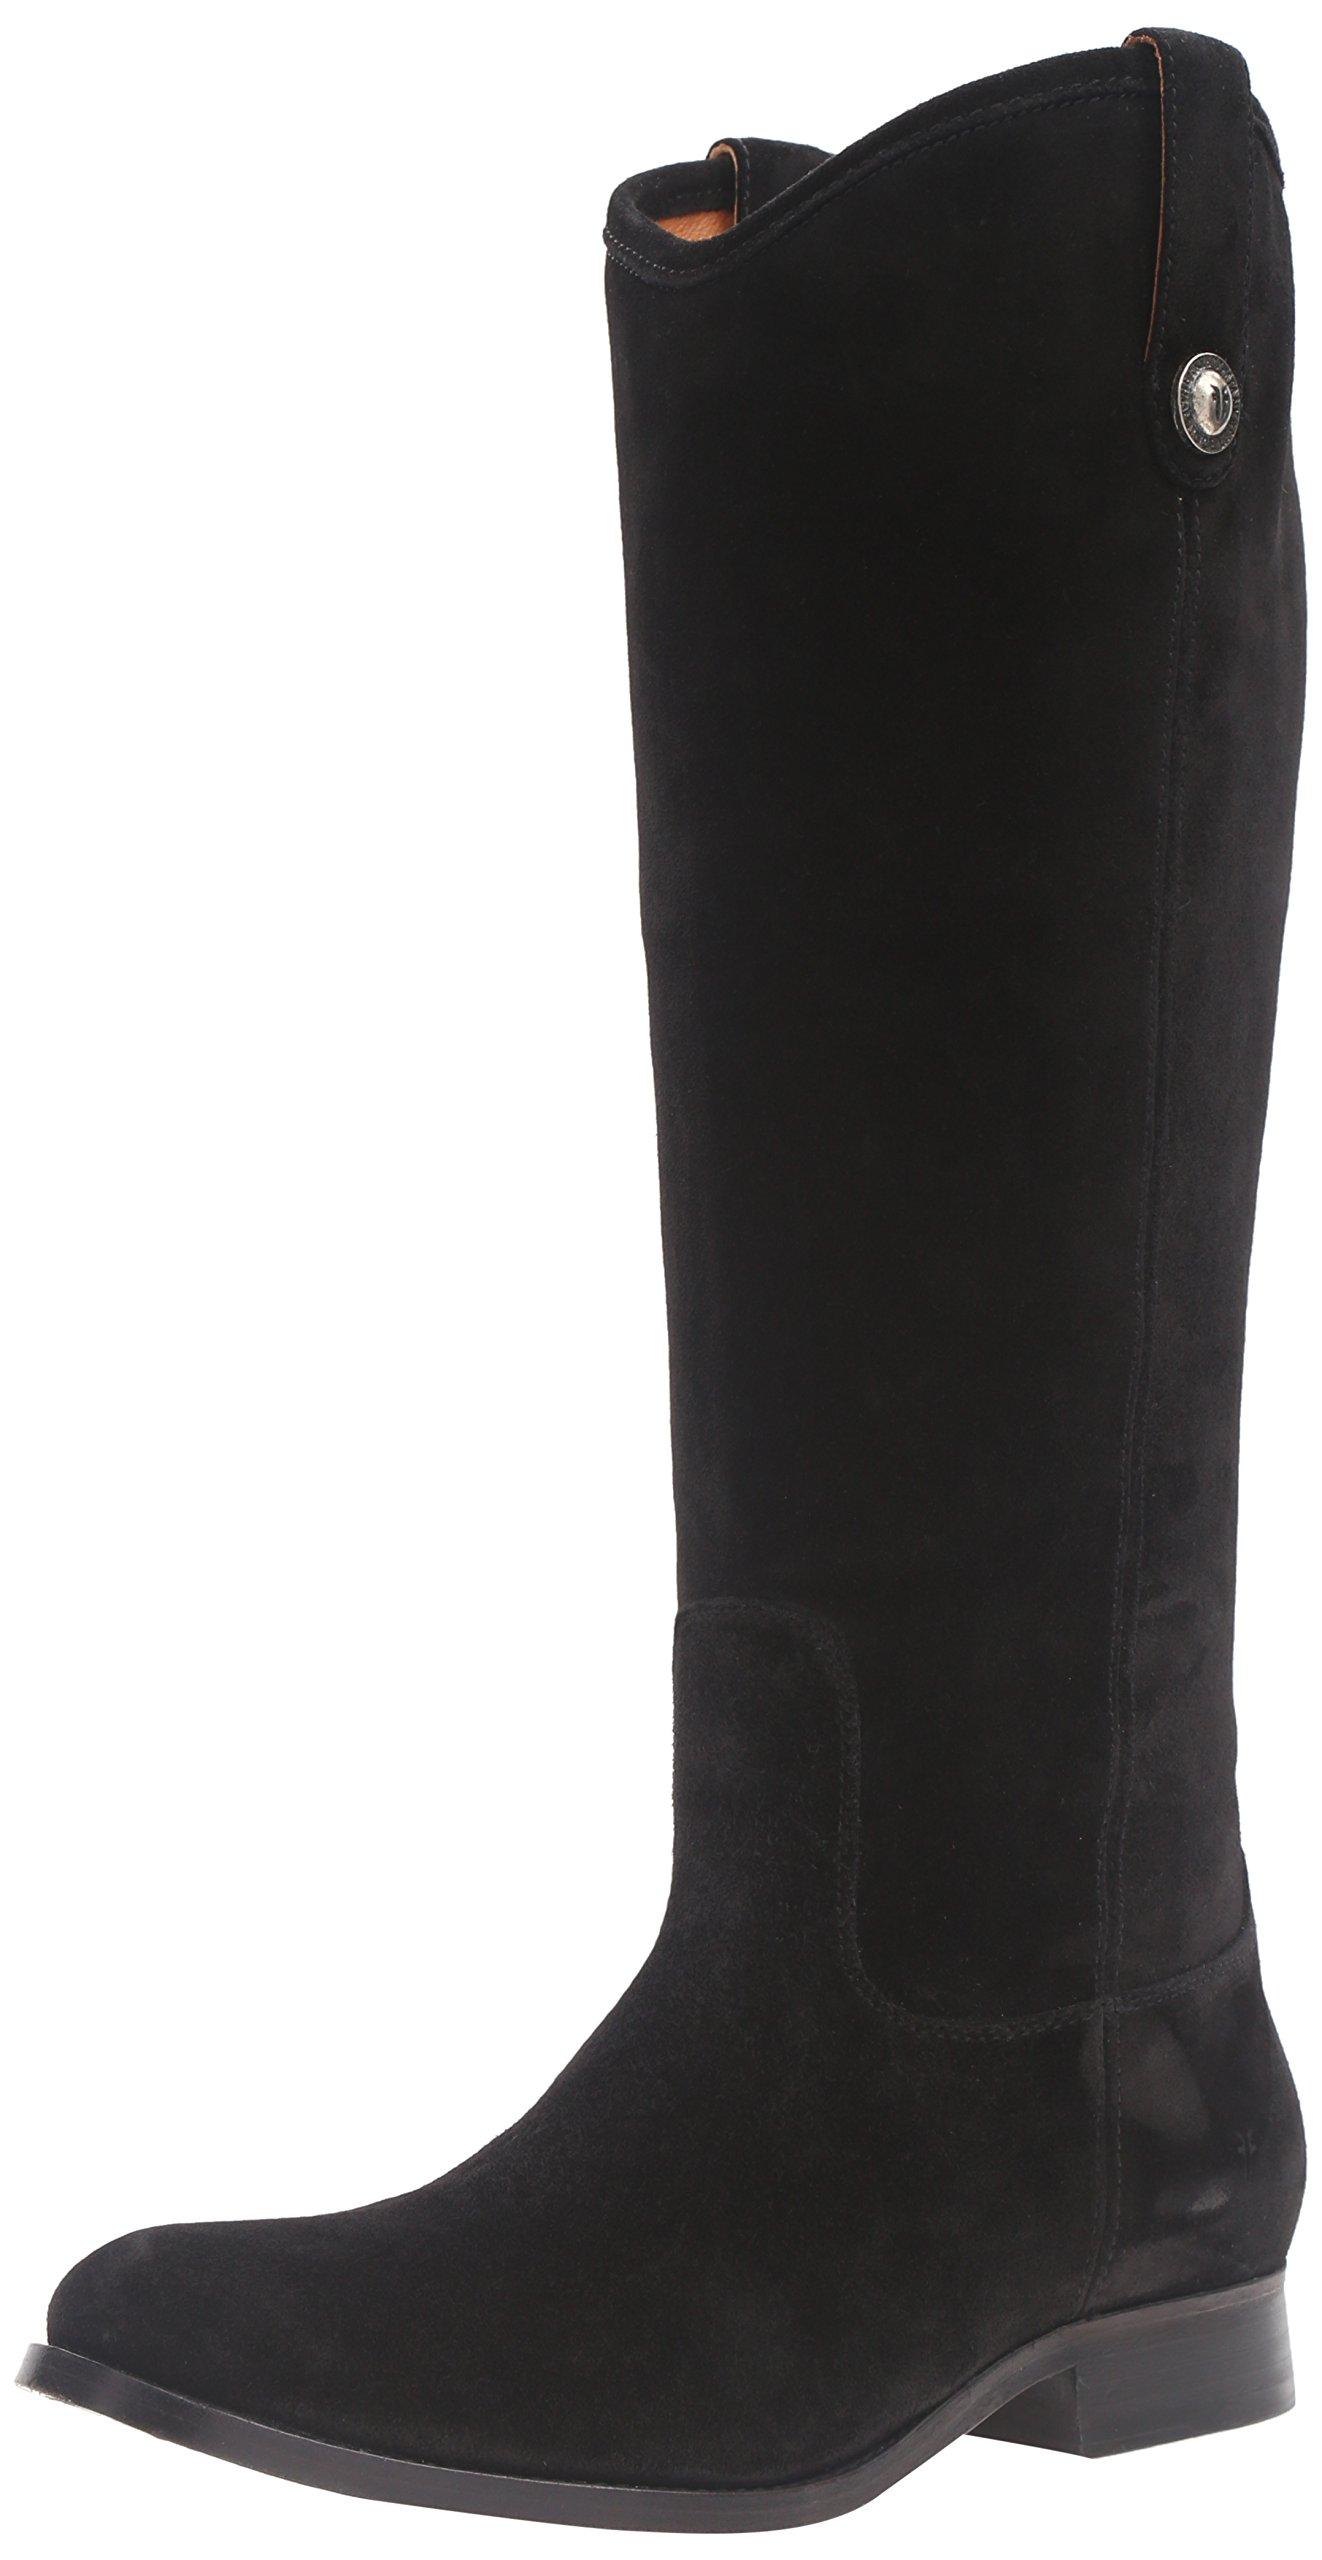 FRYE Women's Melissa Button Riding Boot, Black-77173, 9 M US